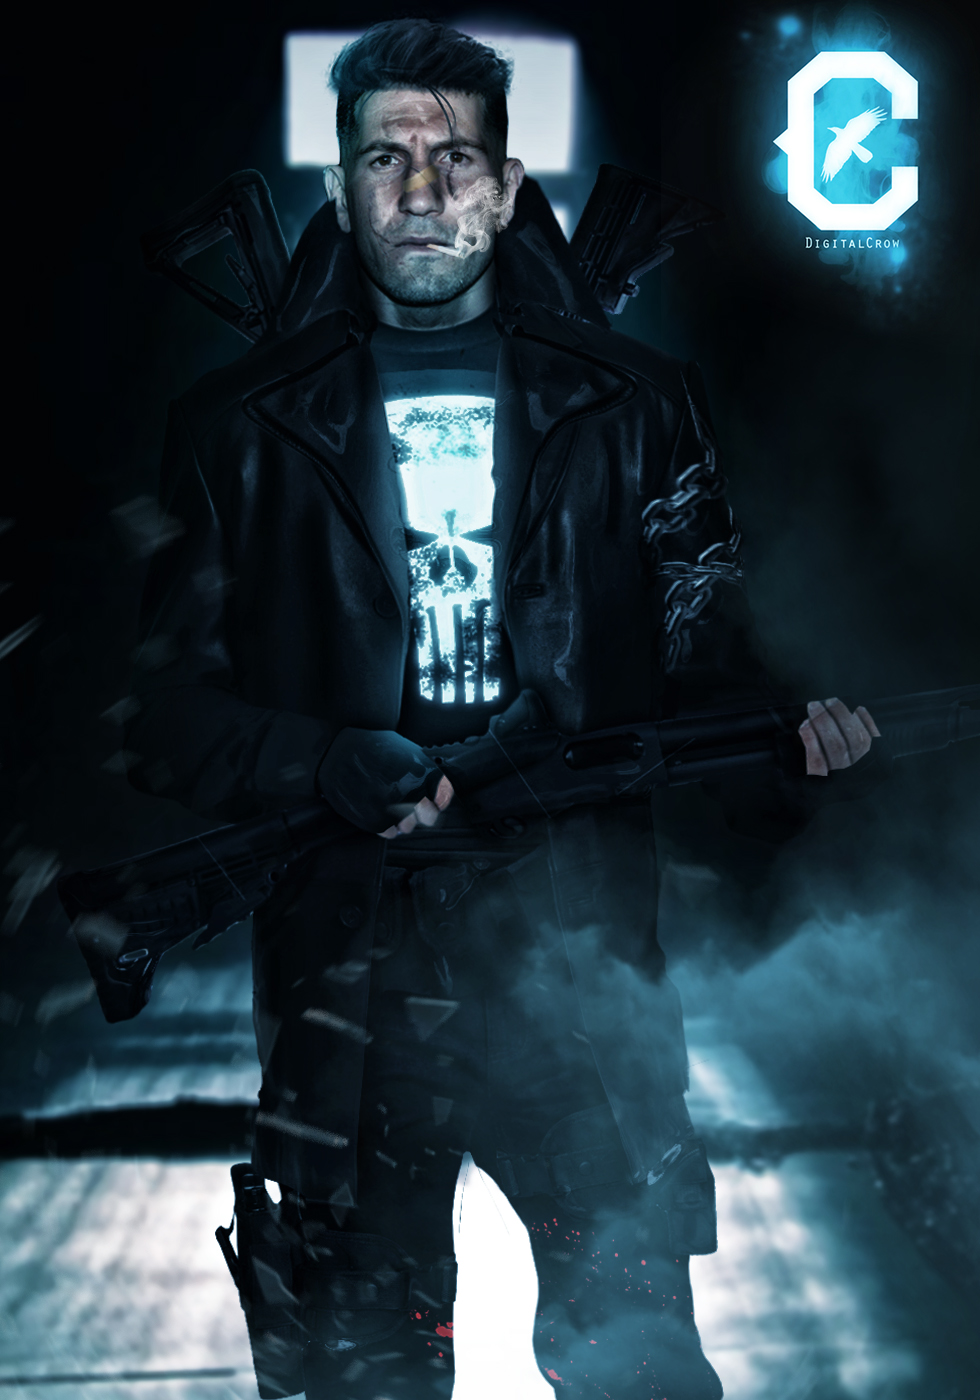 Jon Bernthal As The Punisher By Mubassam On Deviantart